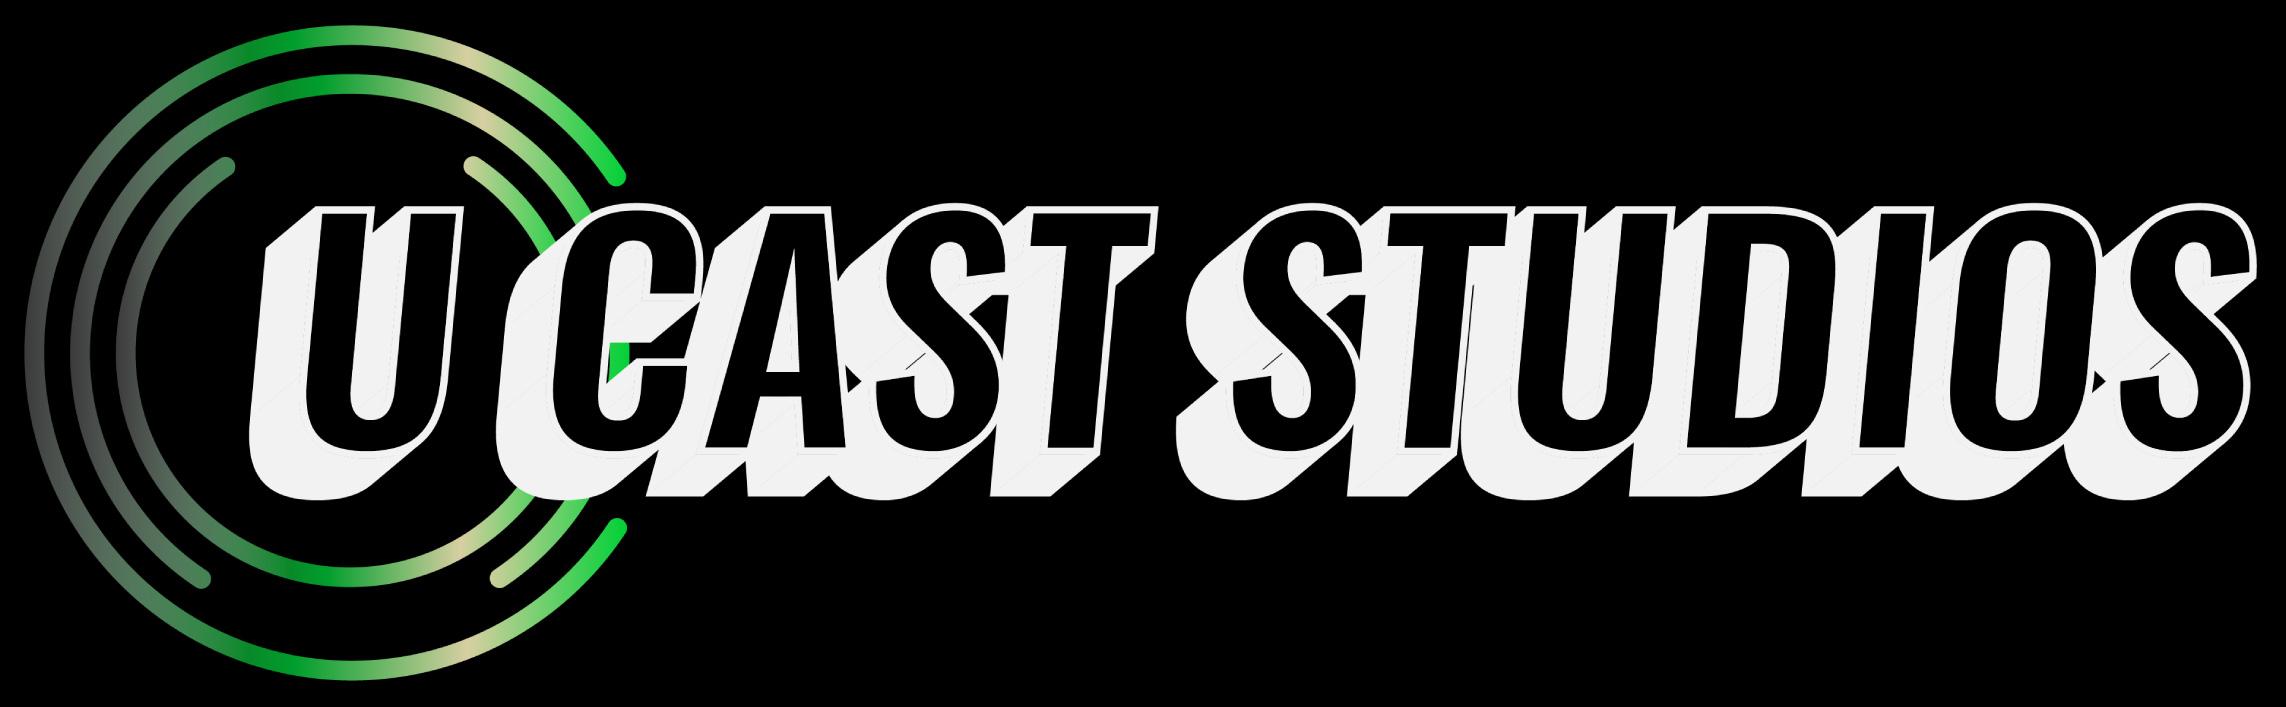 U Cast Studios 2286x707